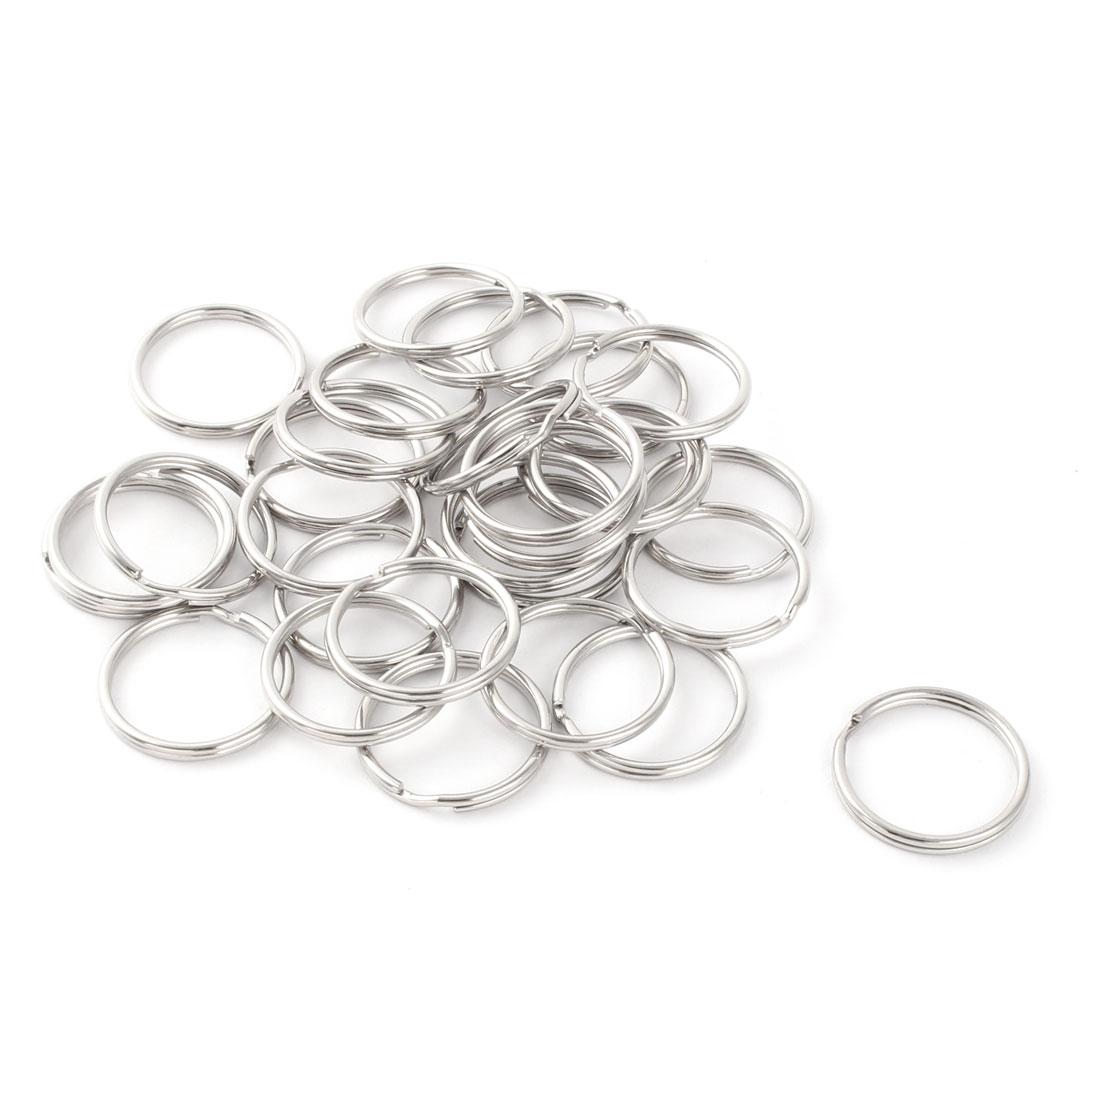 Metal Free DIY Keys Ring Chain Key Split Loop Holder Silver Tone 25mm Diameter 30 Pcs